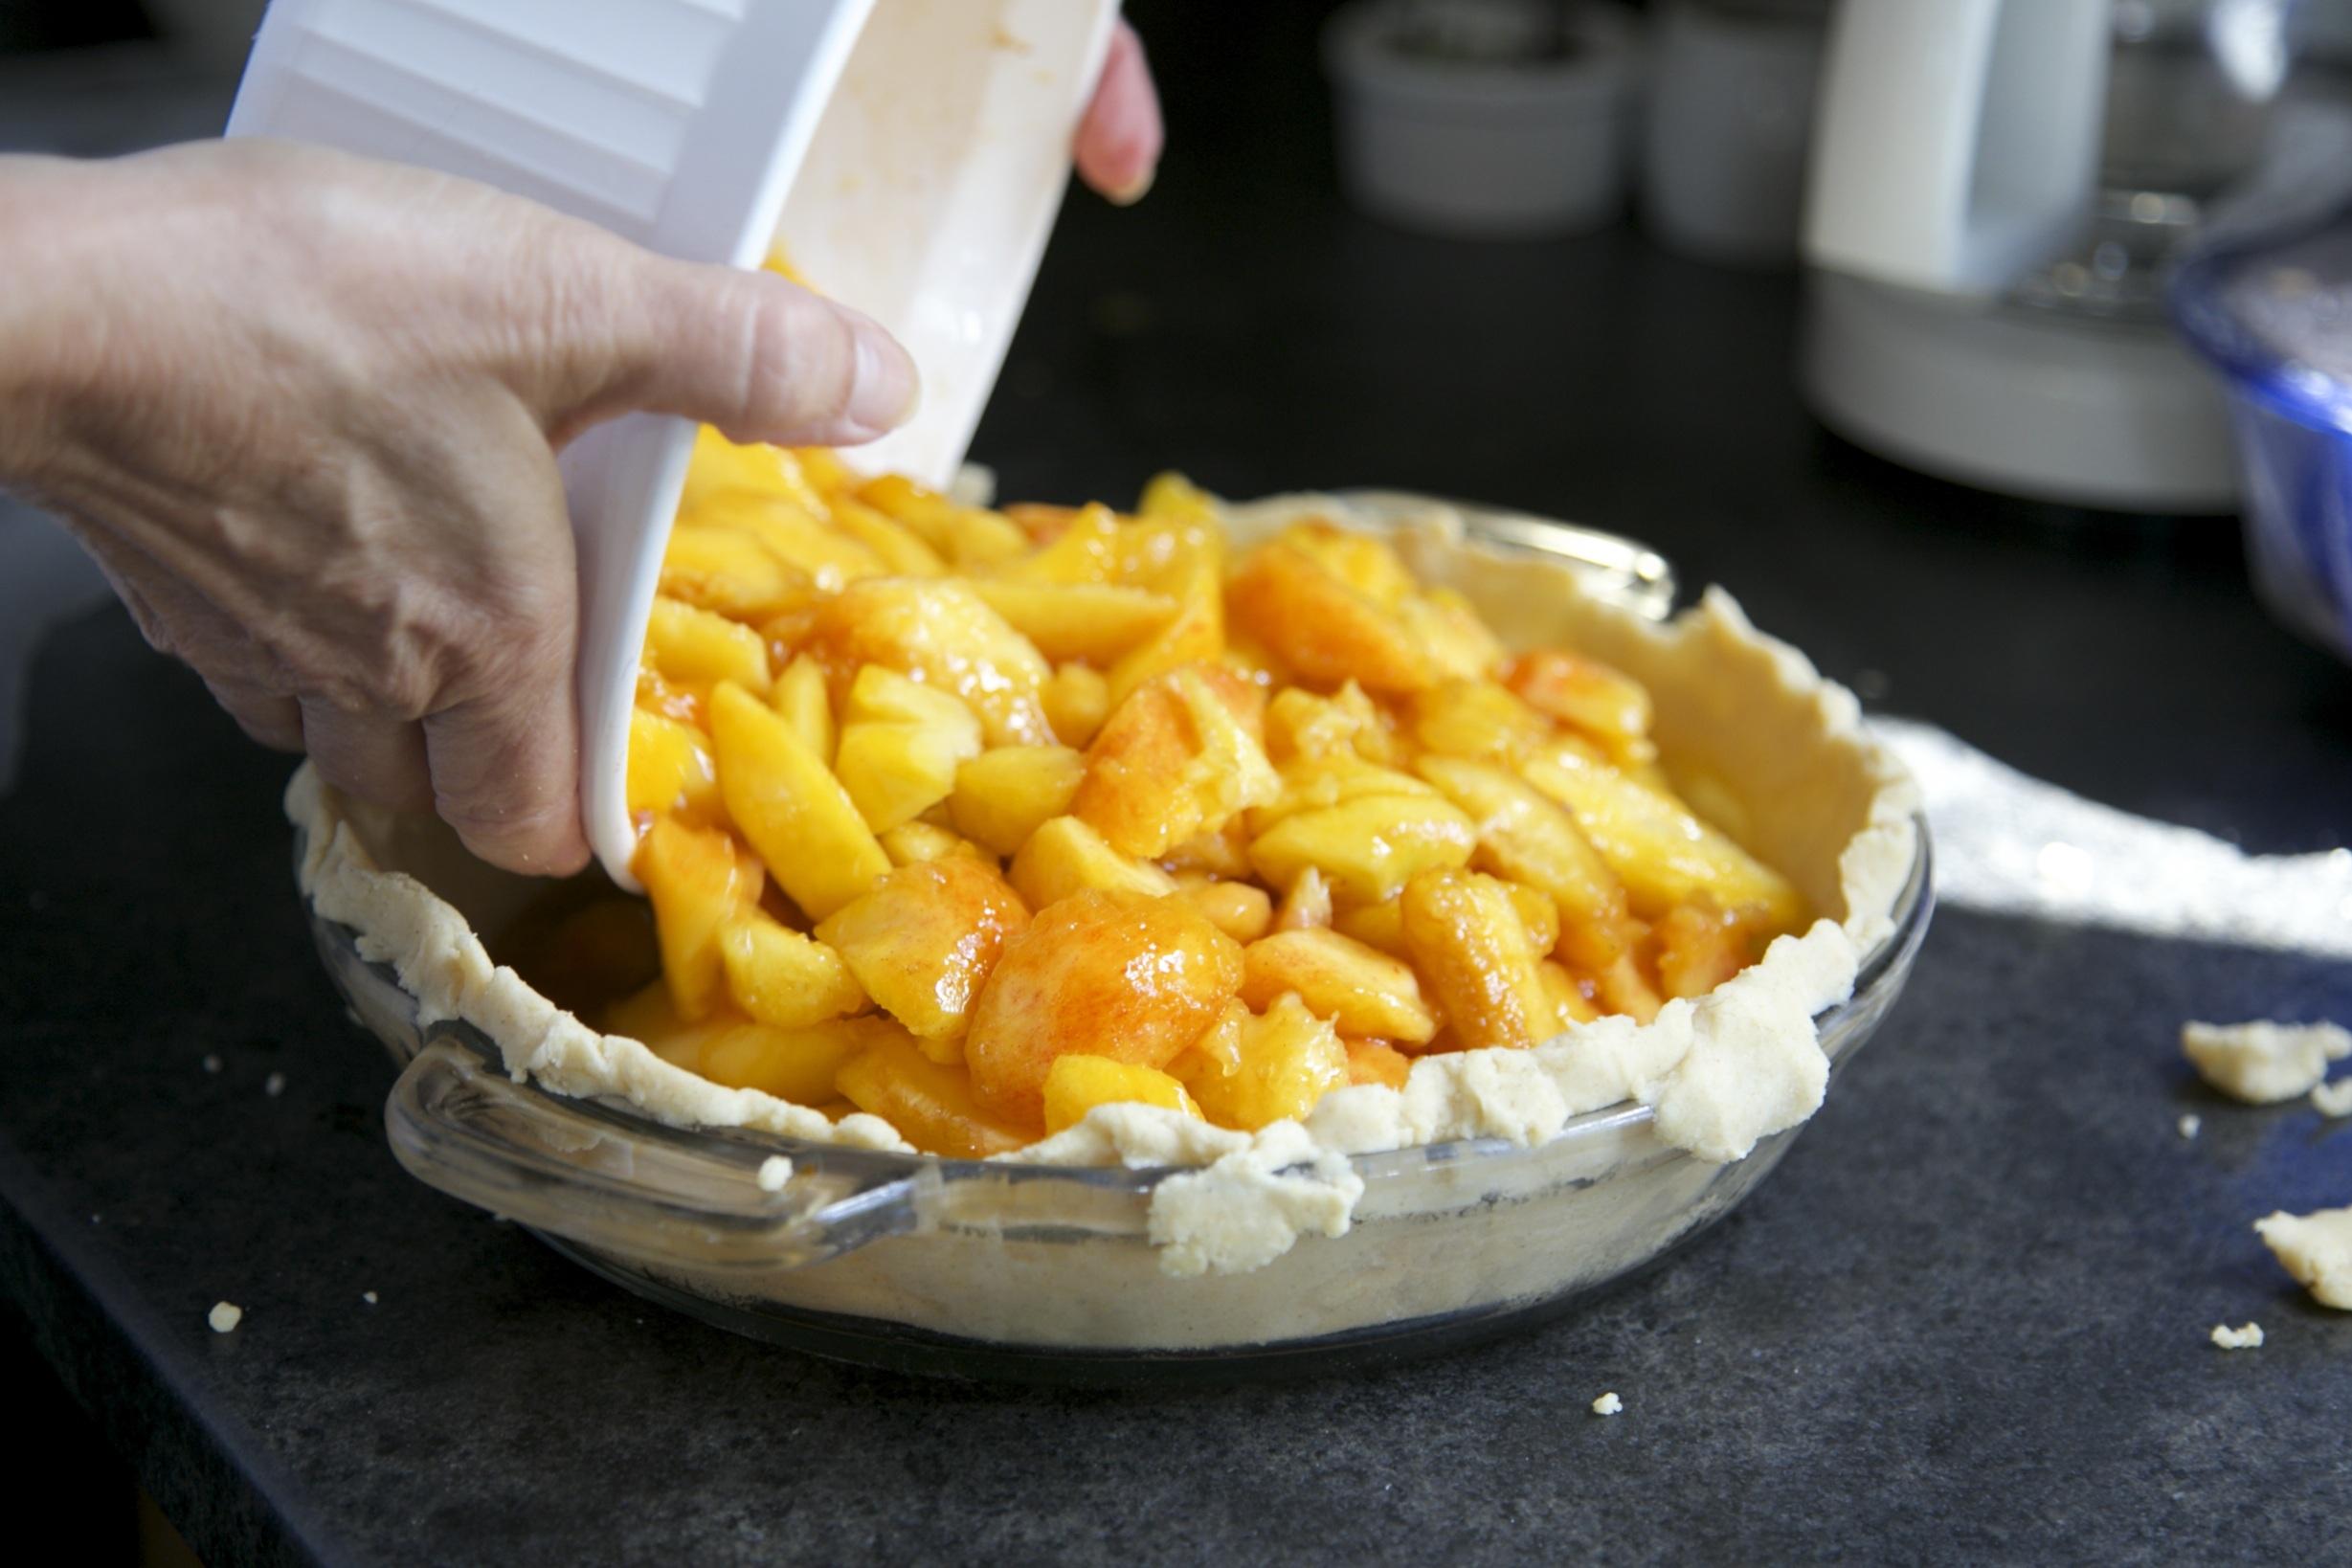 Making Apple Pie | Image Credit: Snapwiresnaps pixabay.com